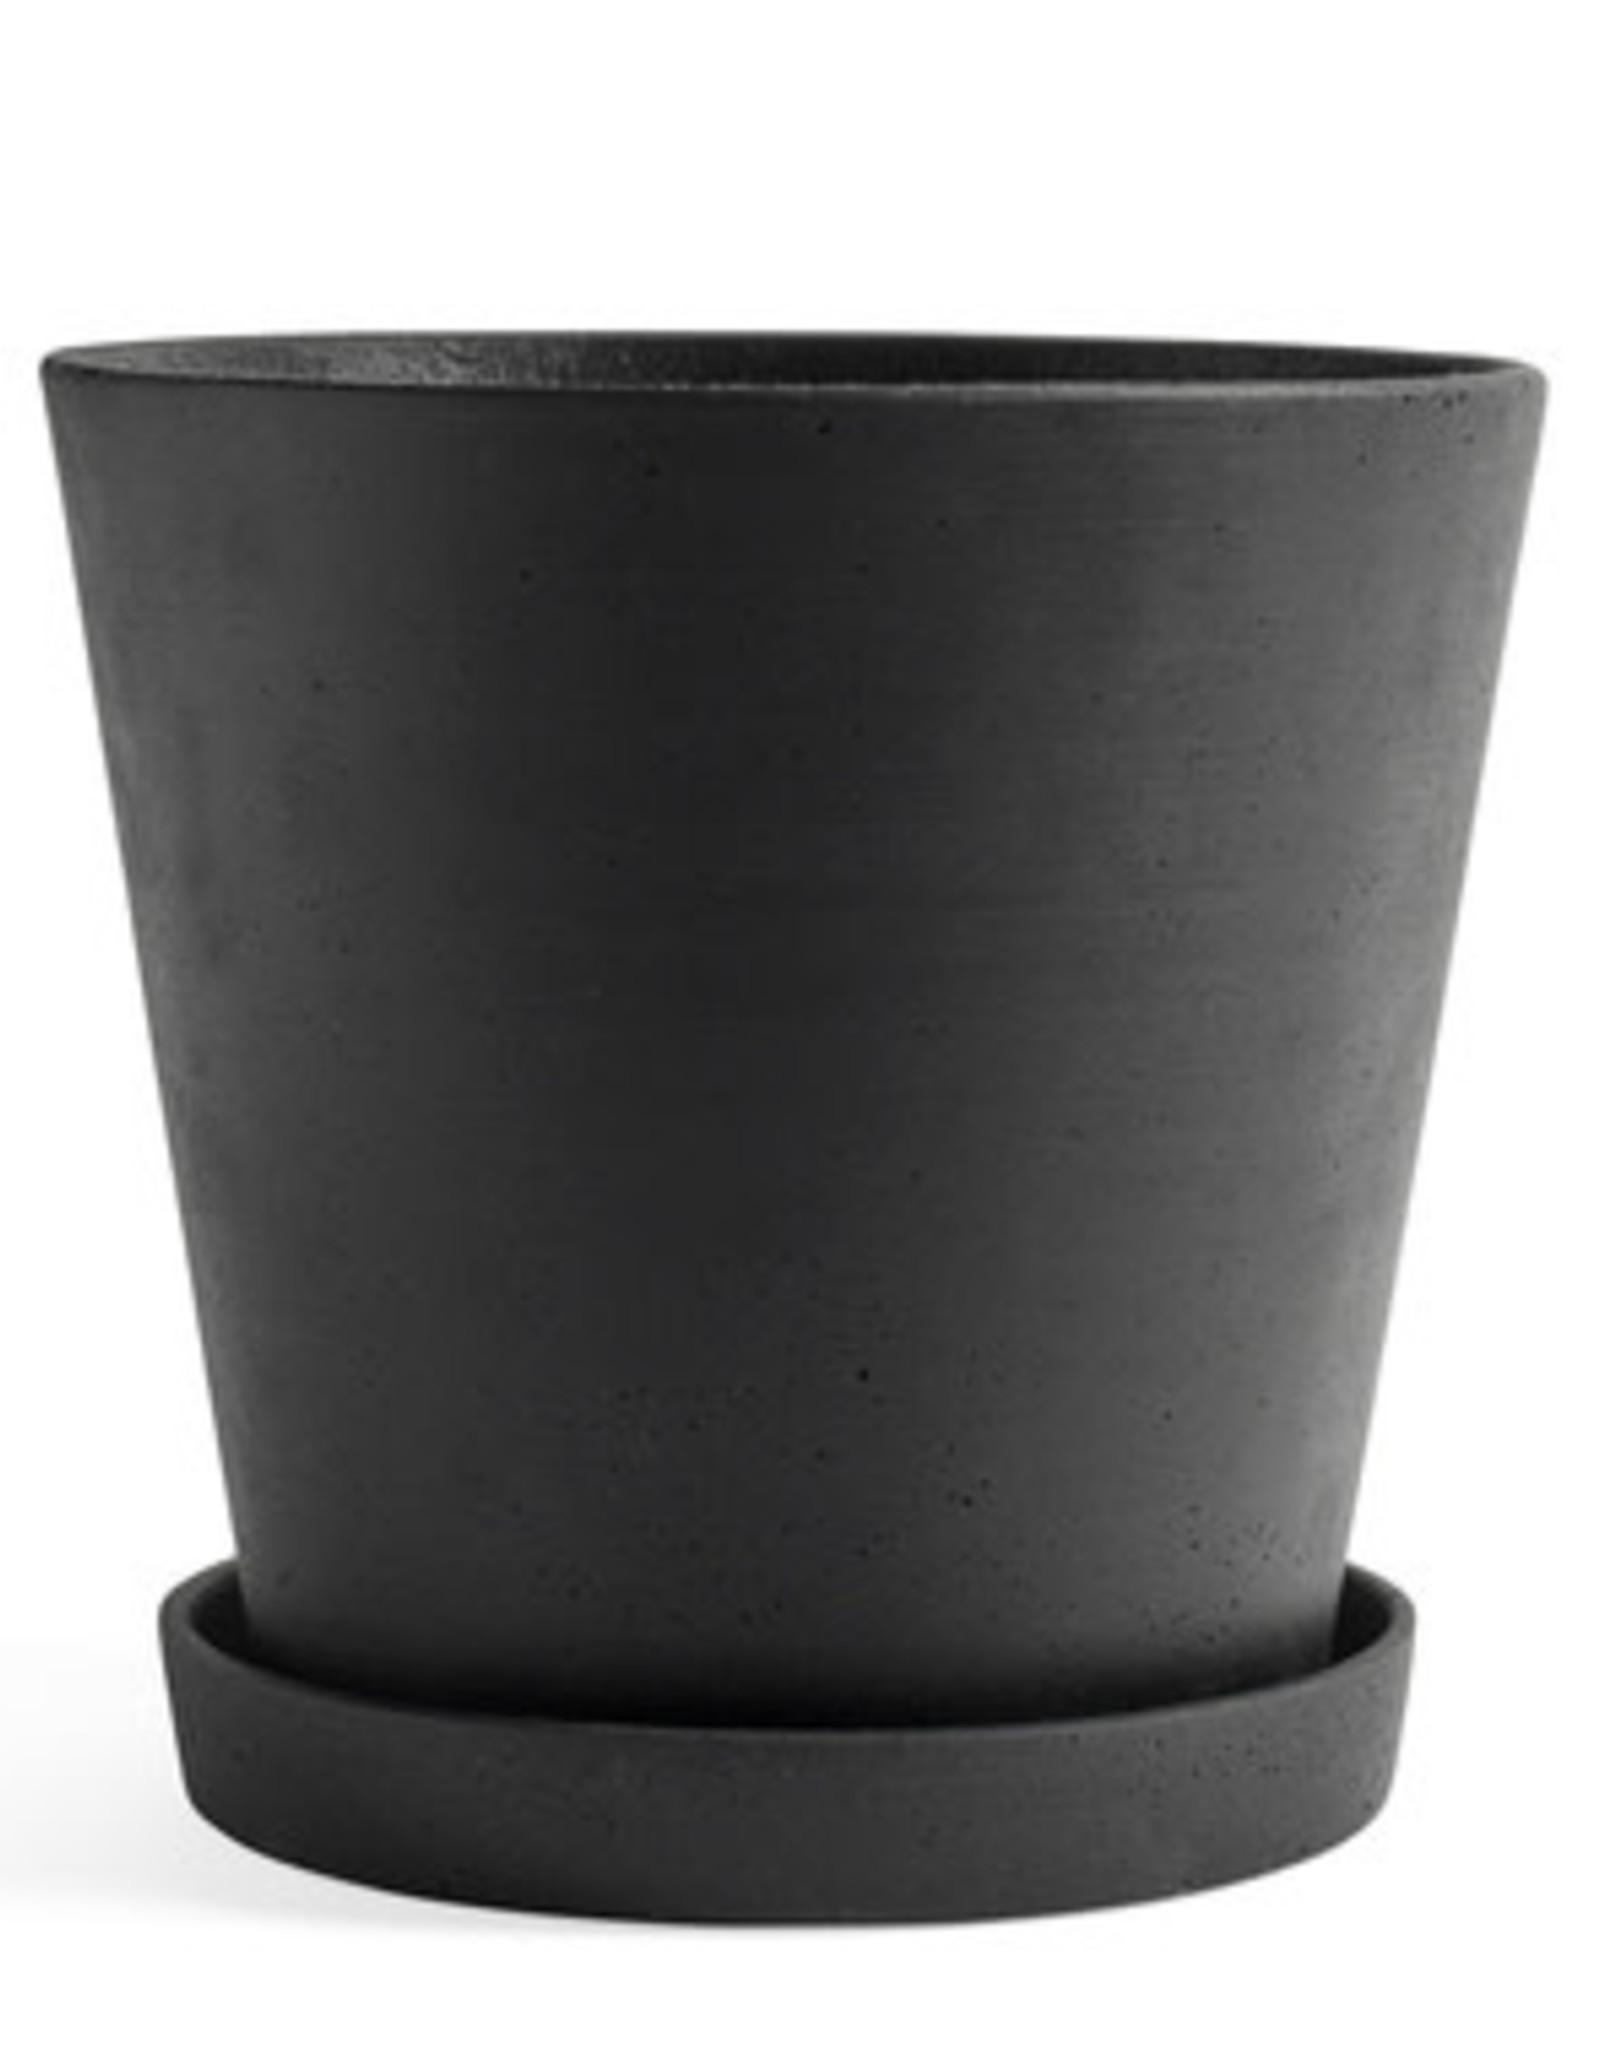 HAY HAY Flowerpot with Saucer XXL Black